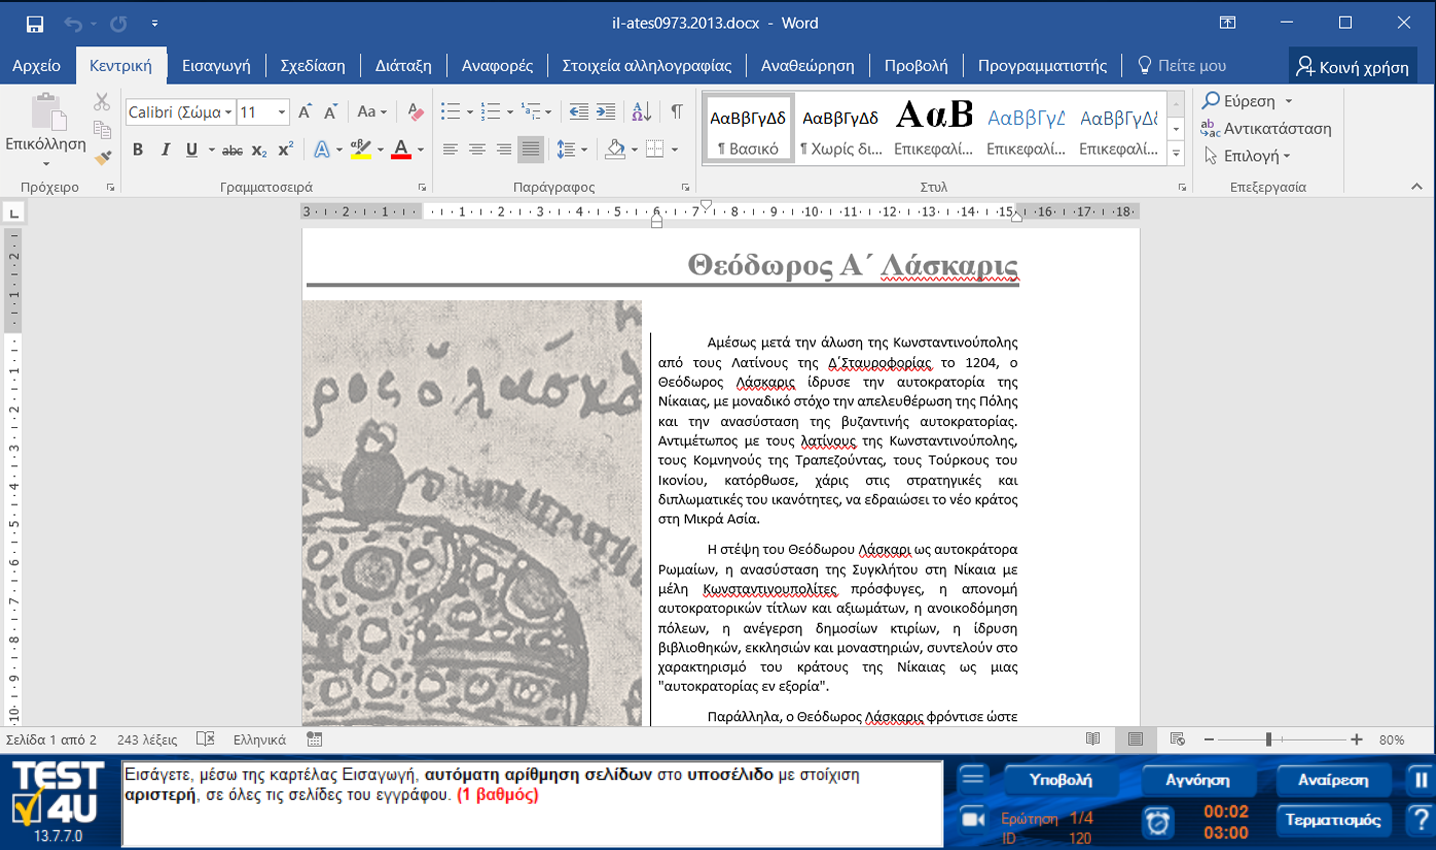 TEST4U Microsoft Word 365, 2019, 2016, 2013, 2010, 2007, 2003 Greek version